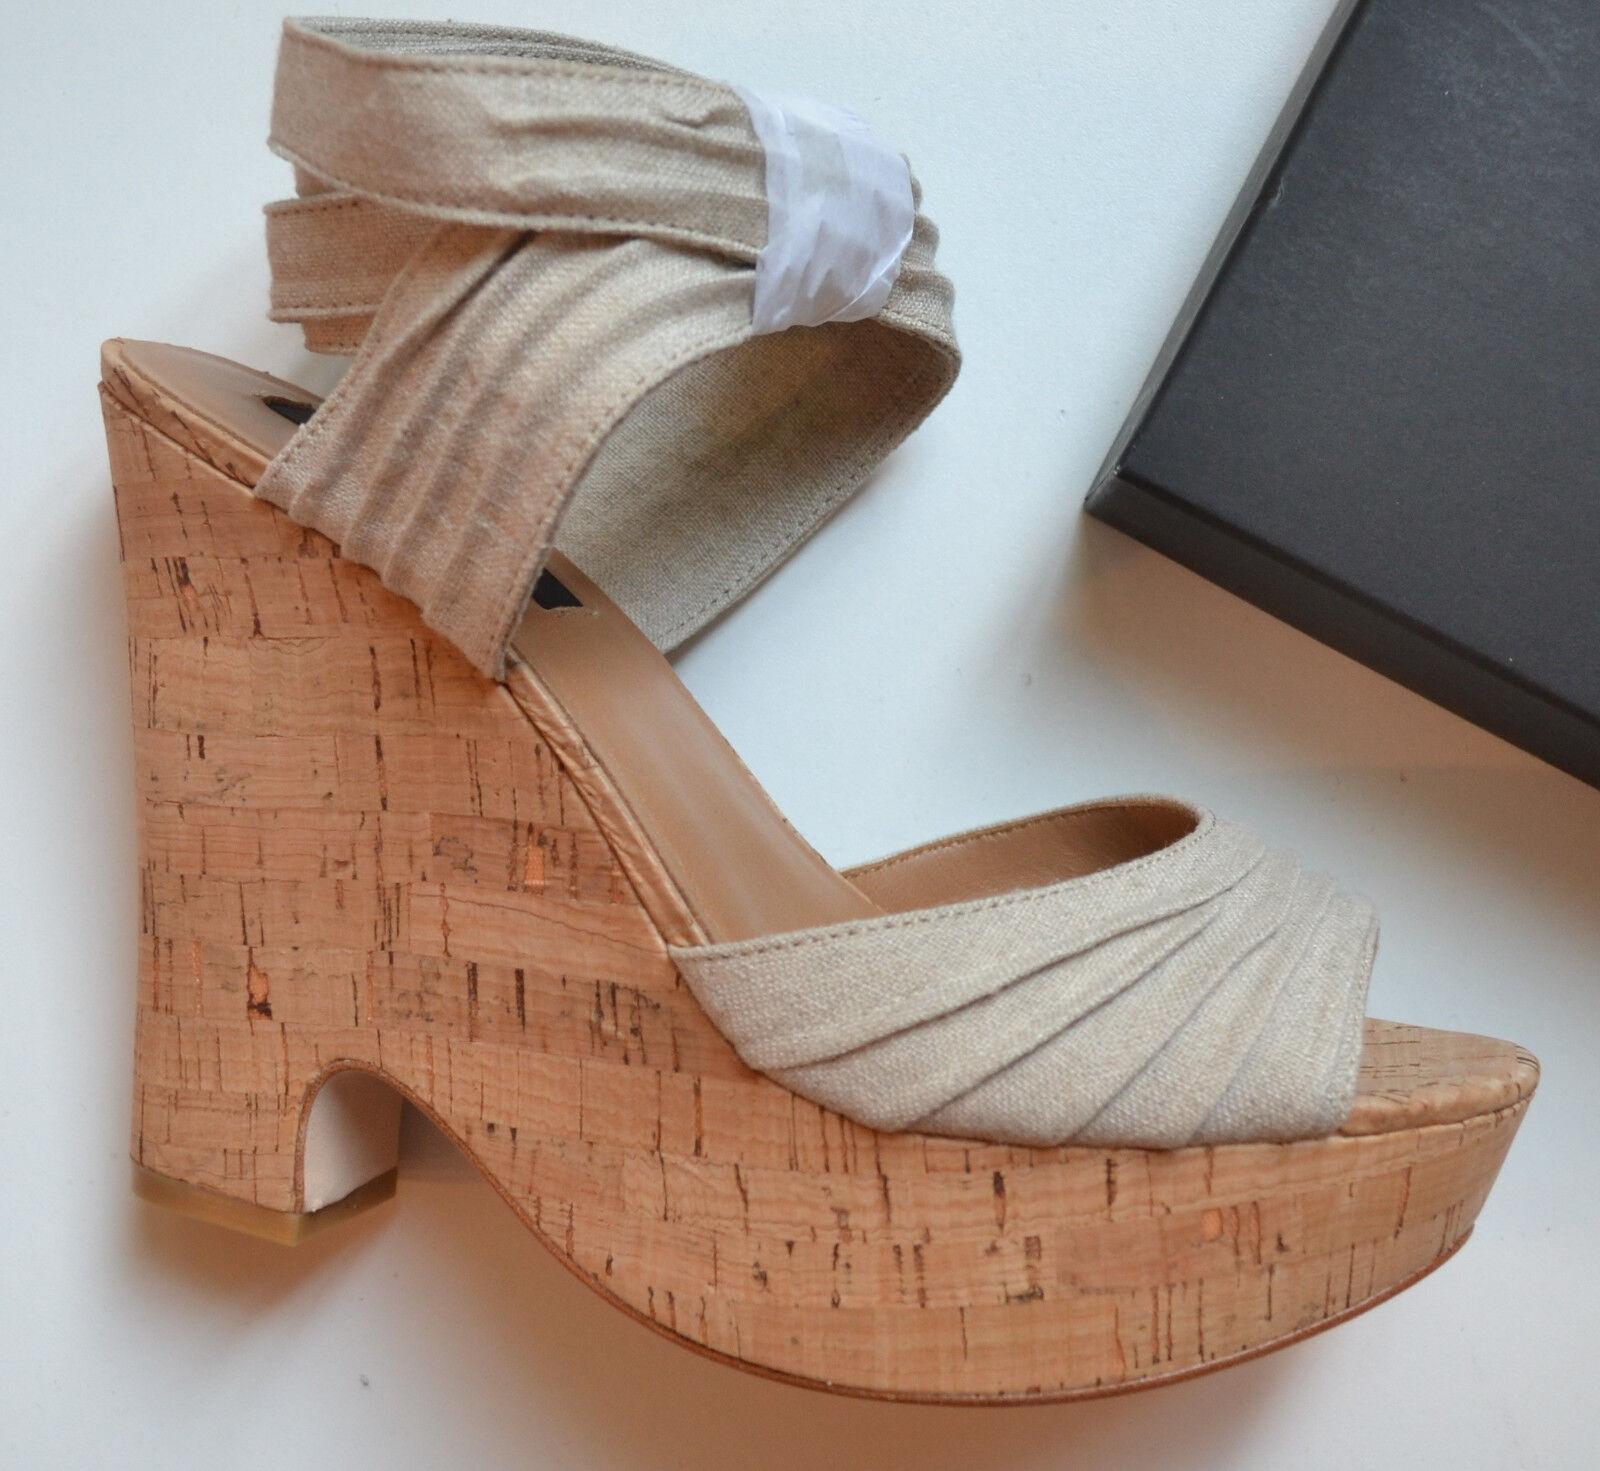 NIB  198 Ann Taylor Cork Wedge Sandals Size 7.5(US)